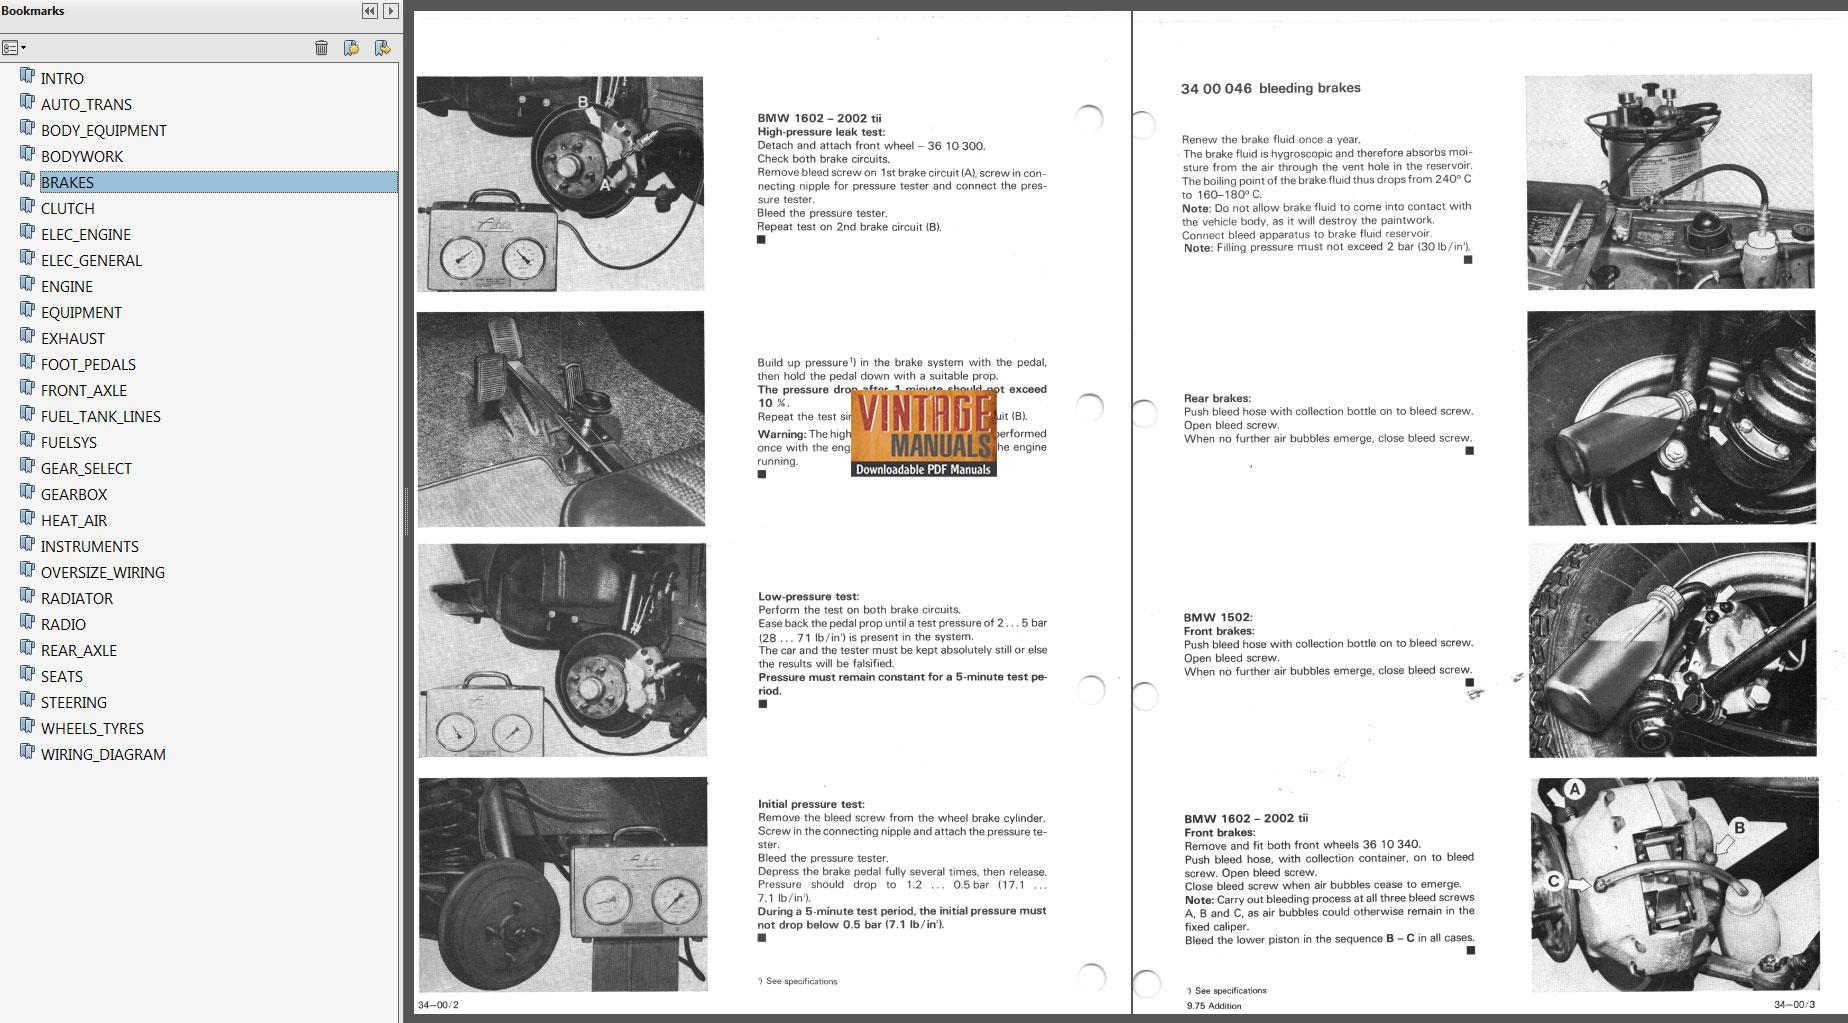 Breathtaking BMW 2002 Wiring Diagram Pdf Ideas - Best Image Engine ...